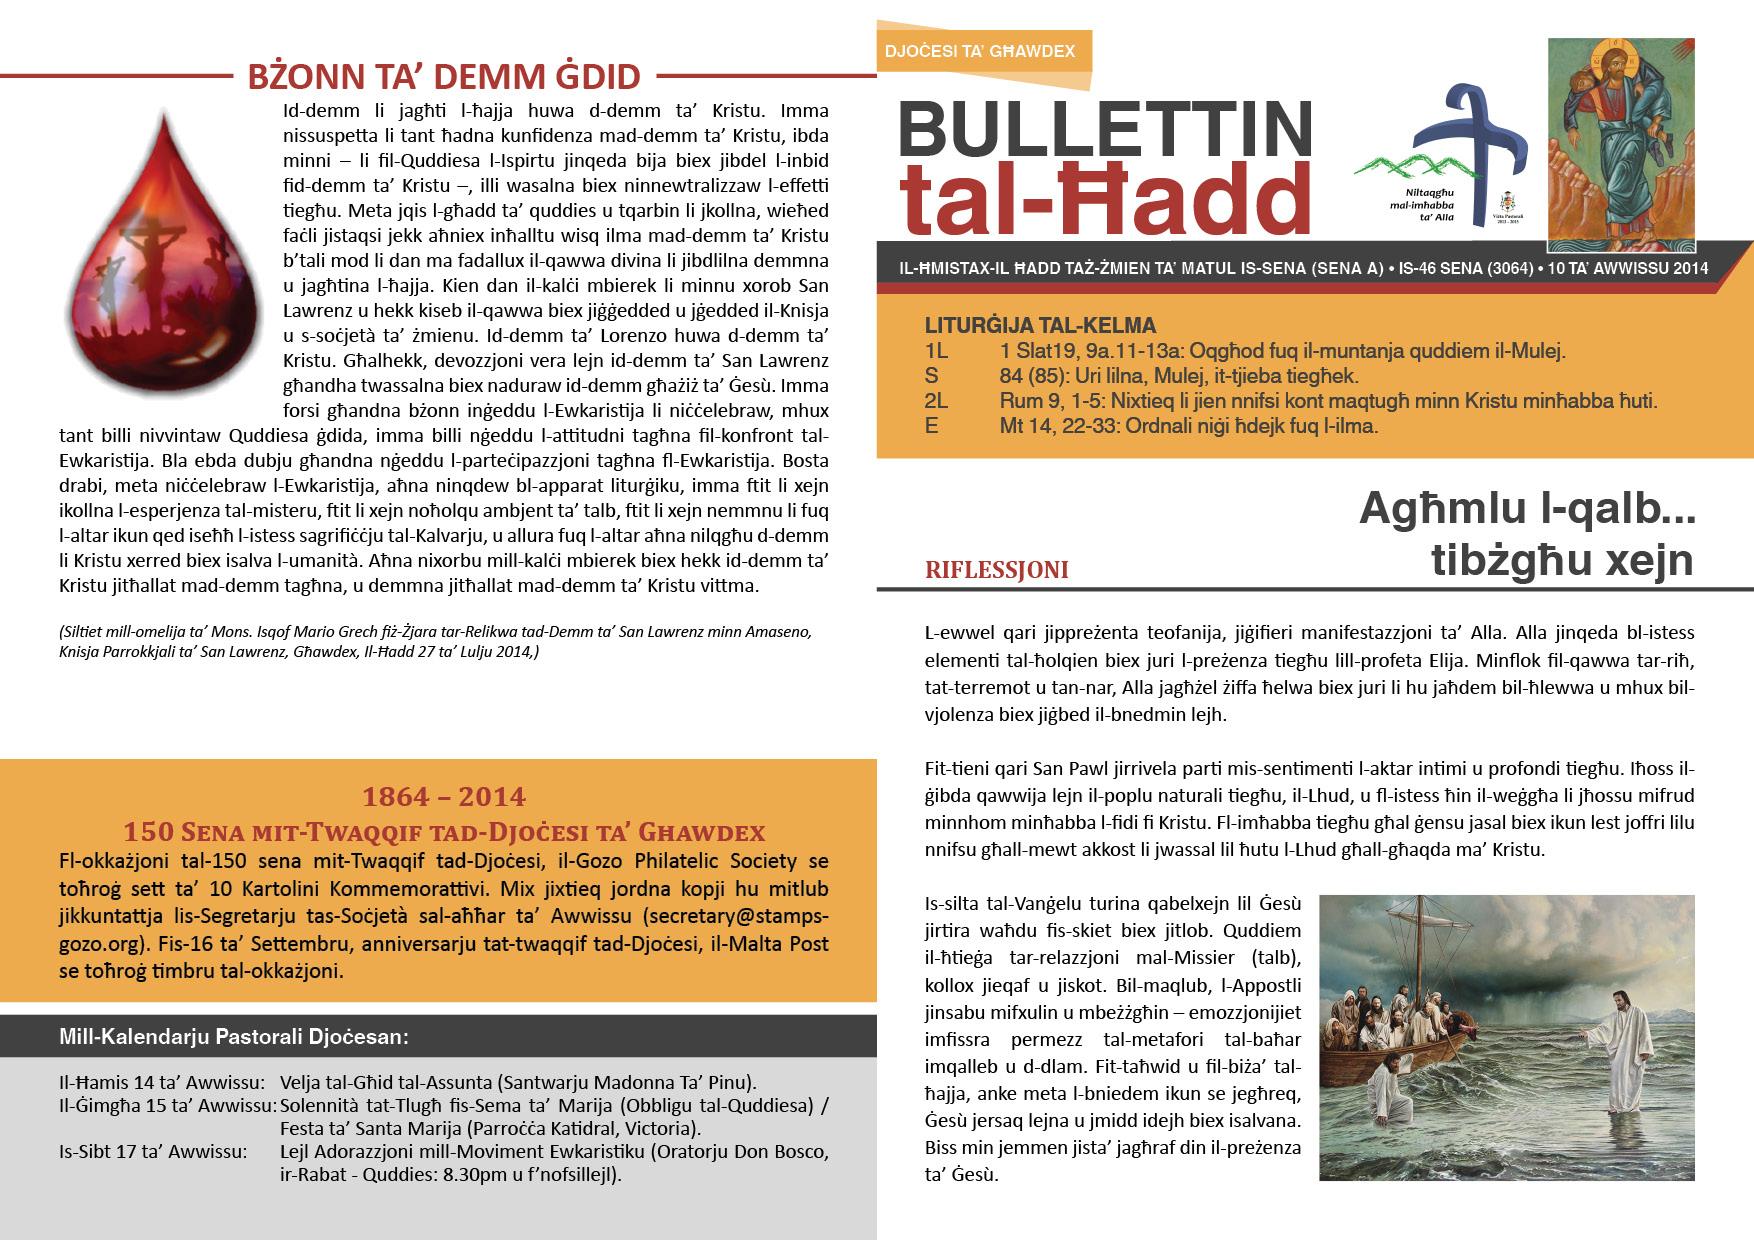 bullettin-2014-awwissu-10.jpg